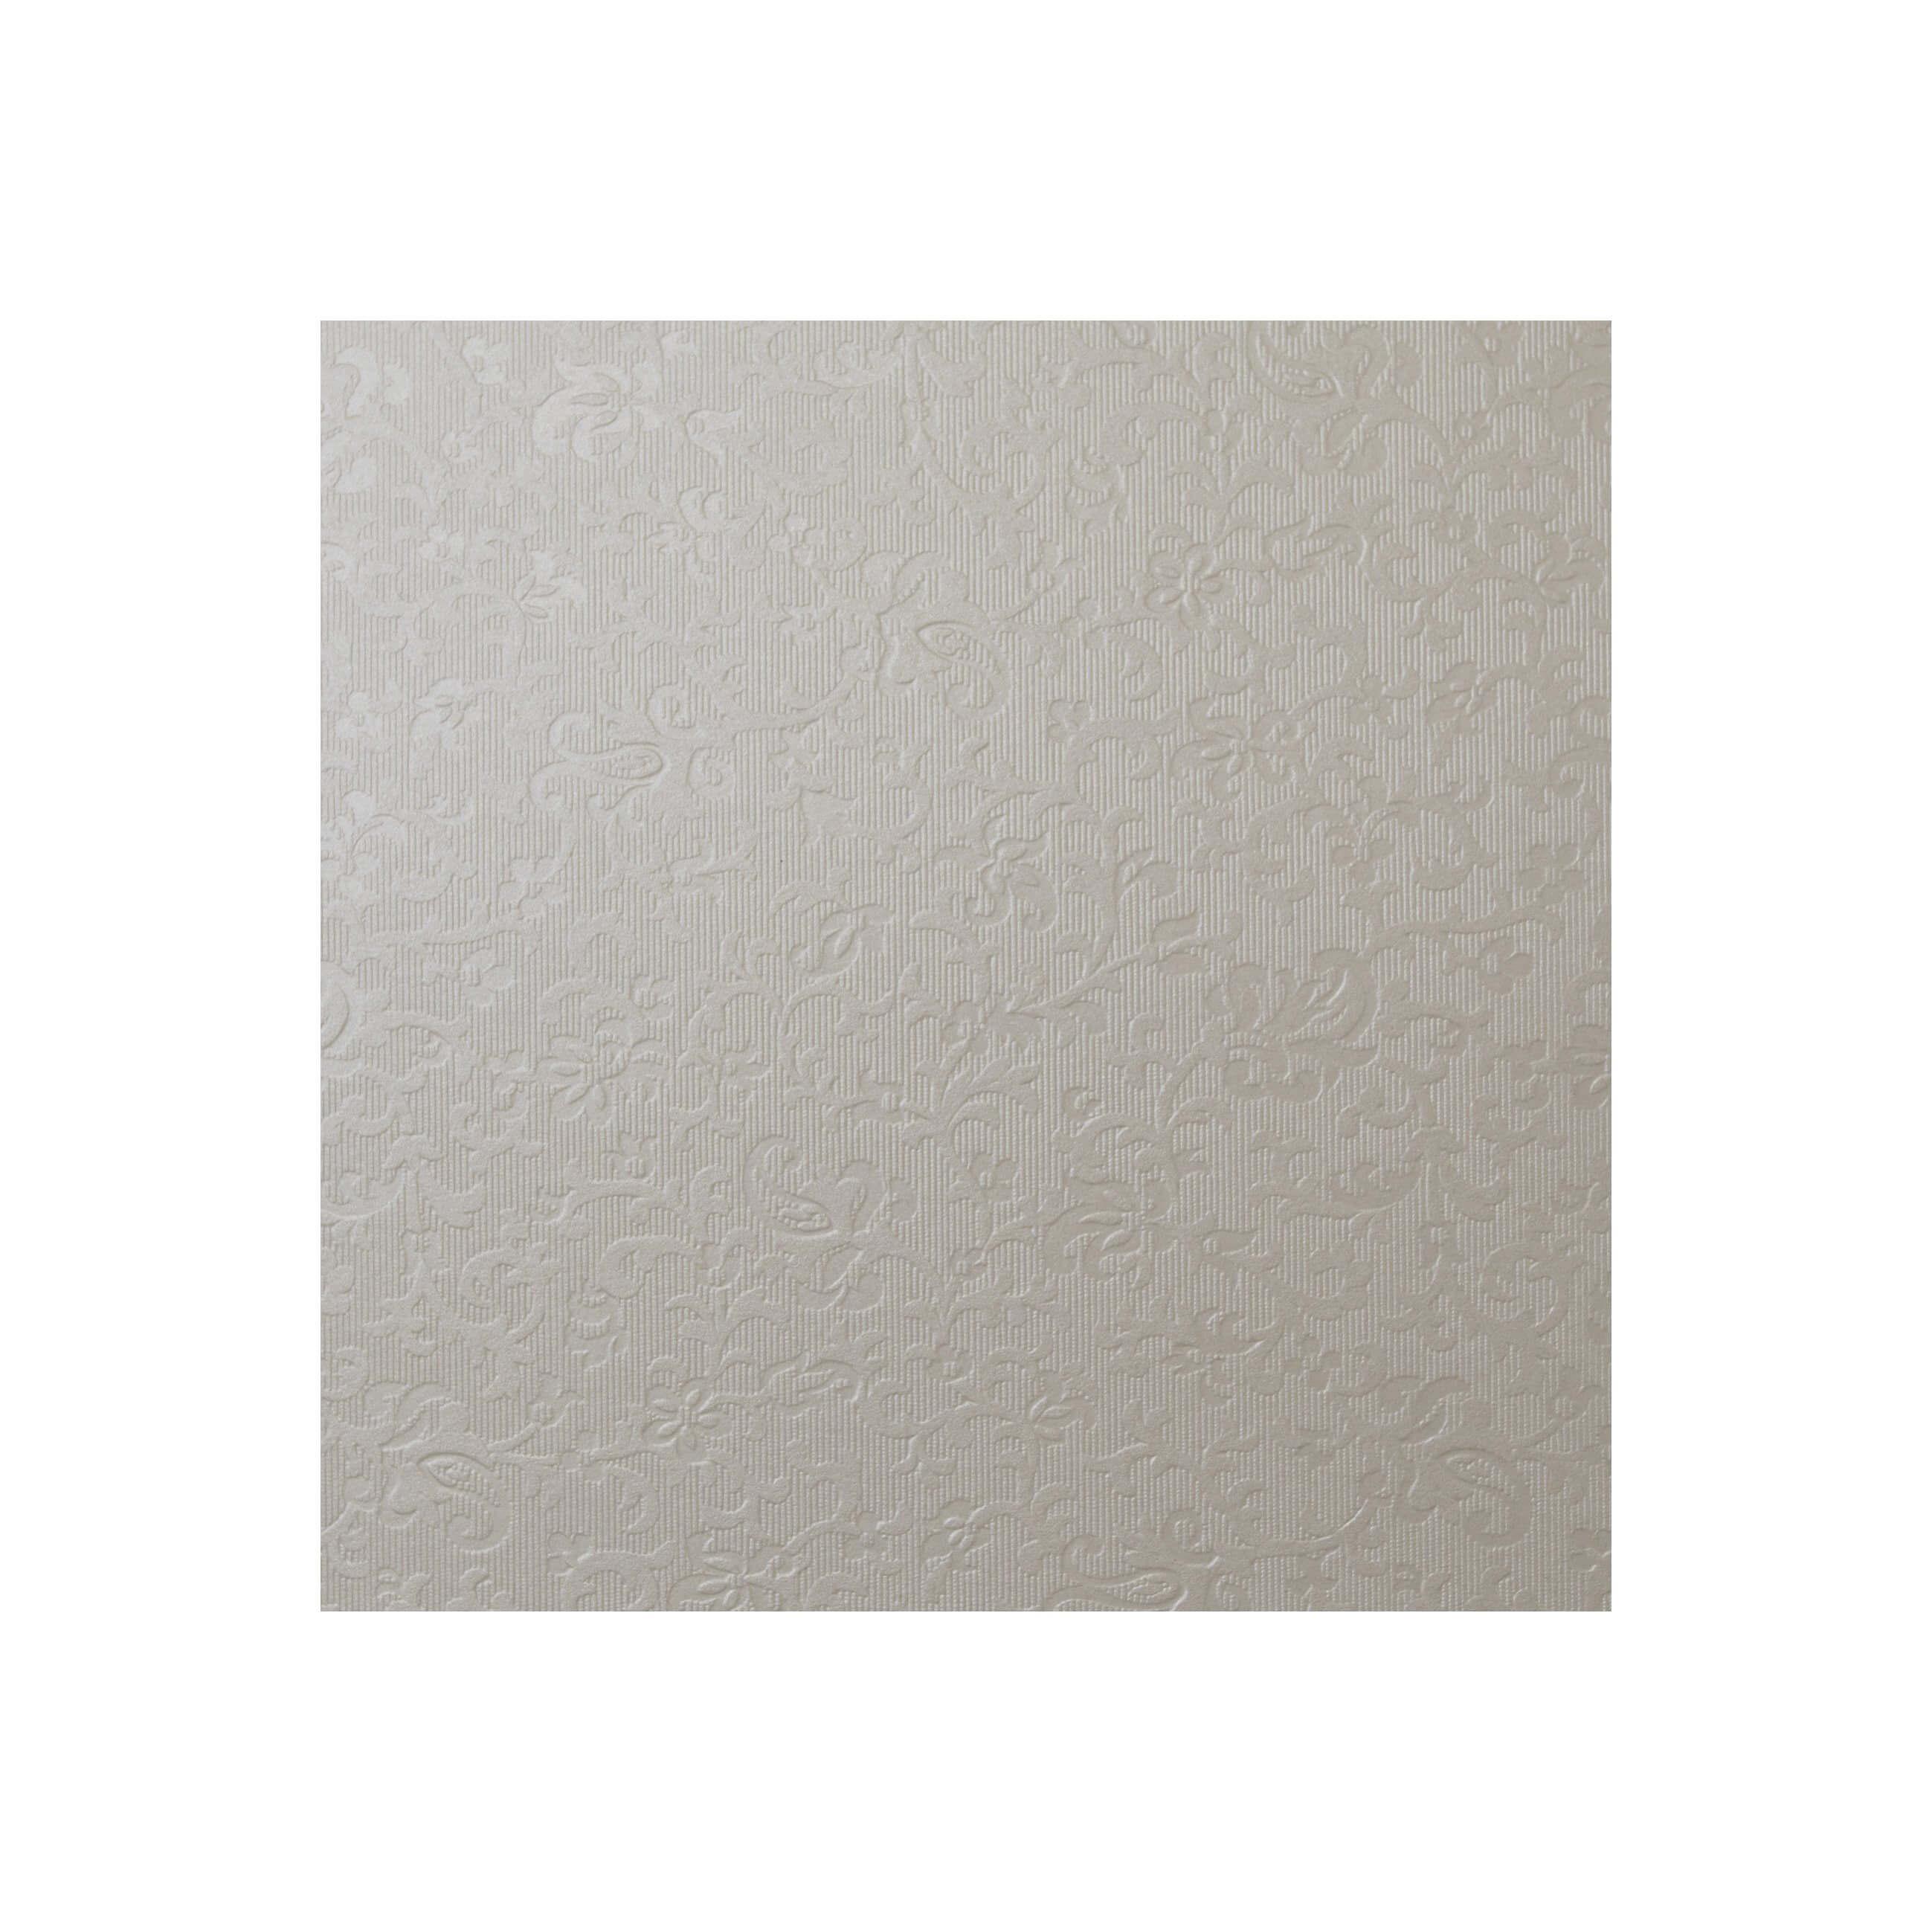 Cardstock 147mm Square - Applique Ivory